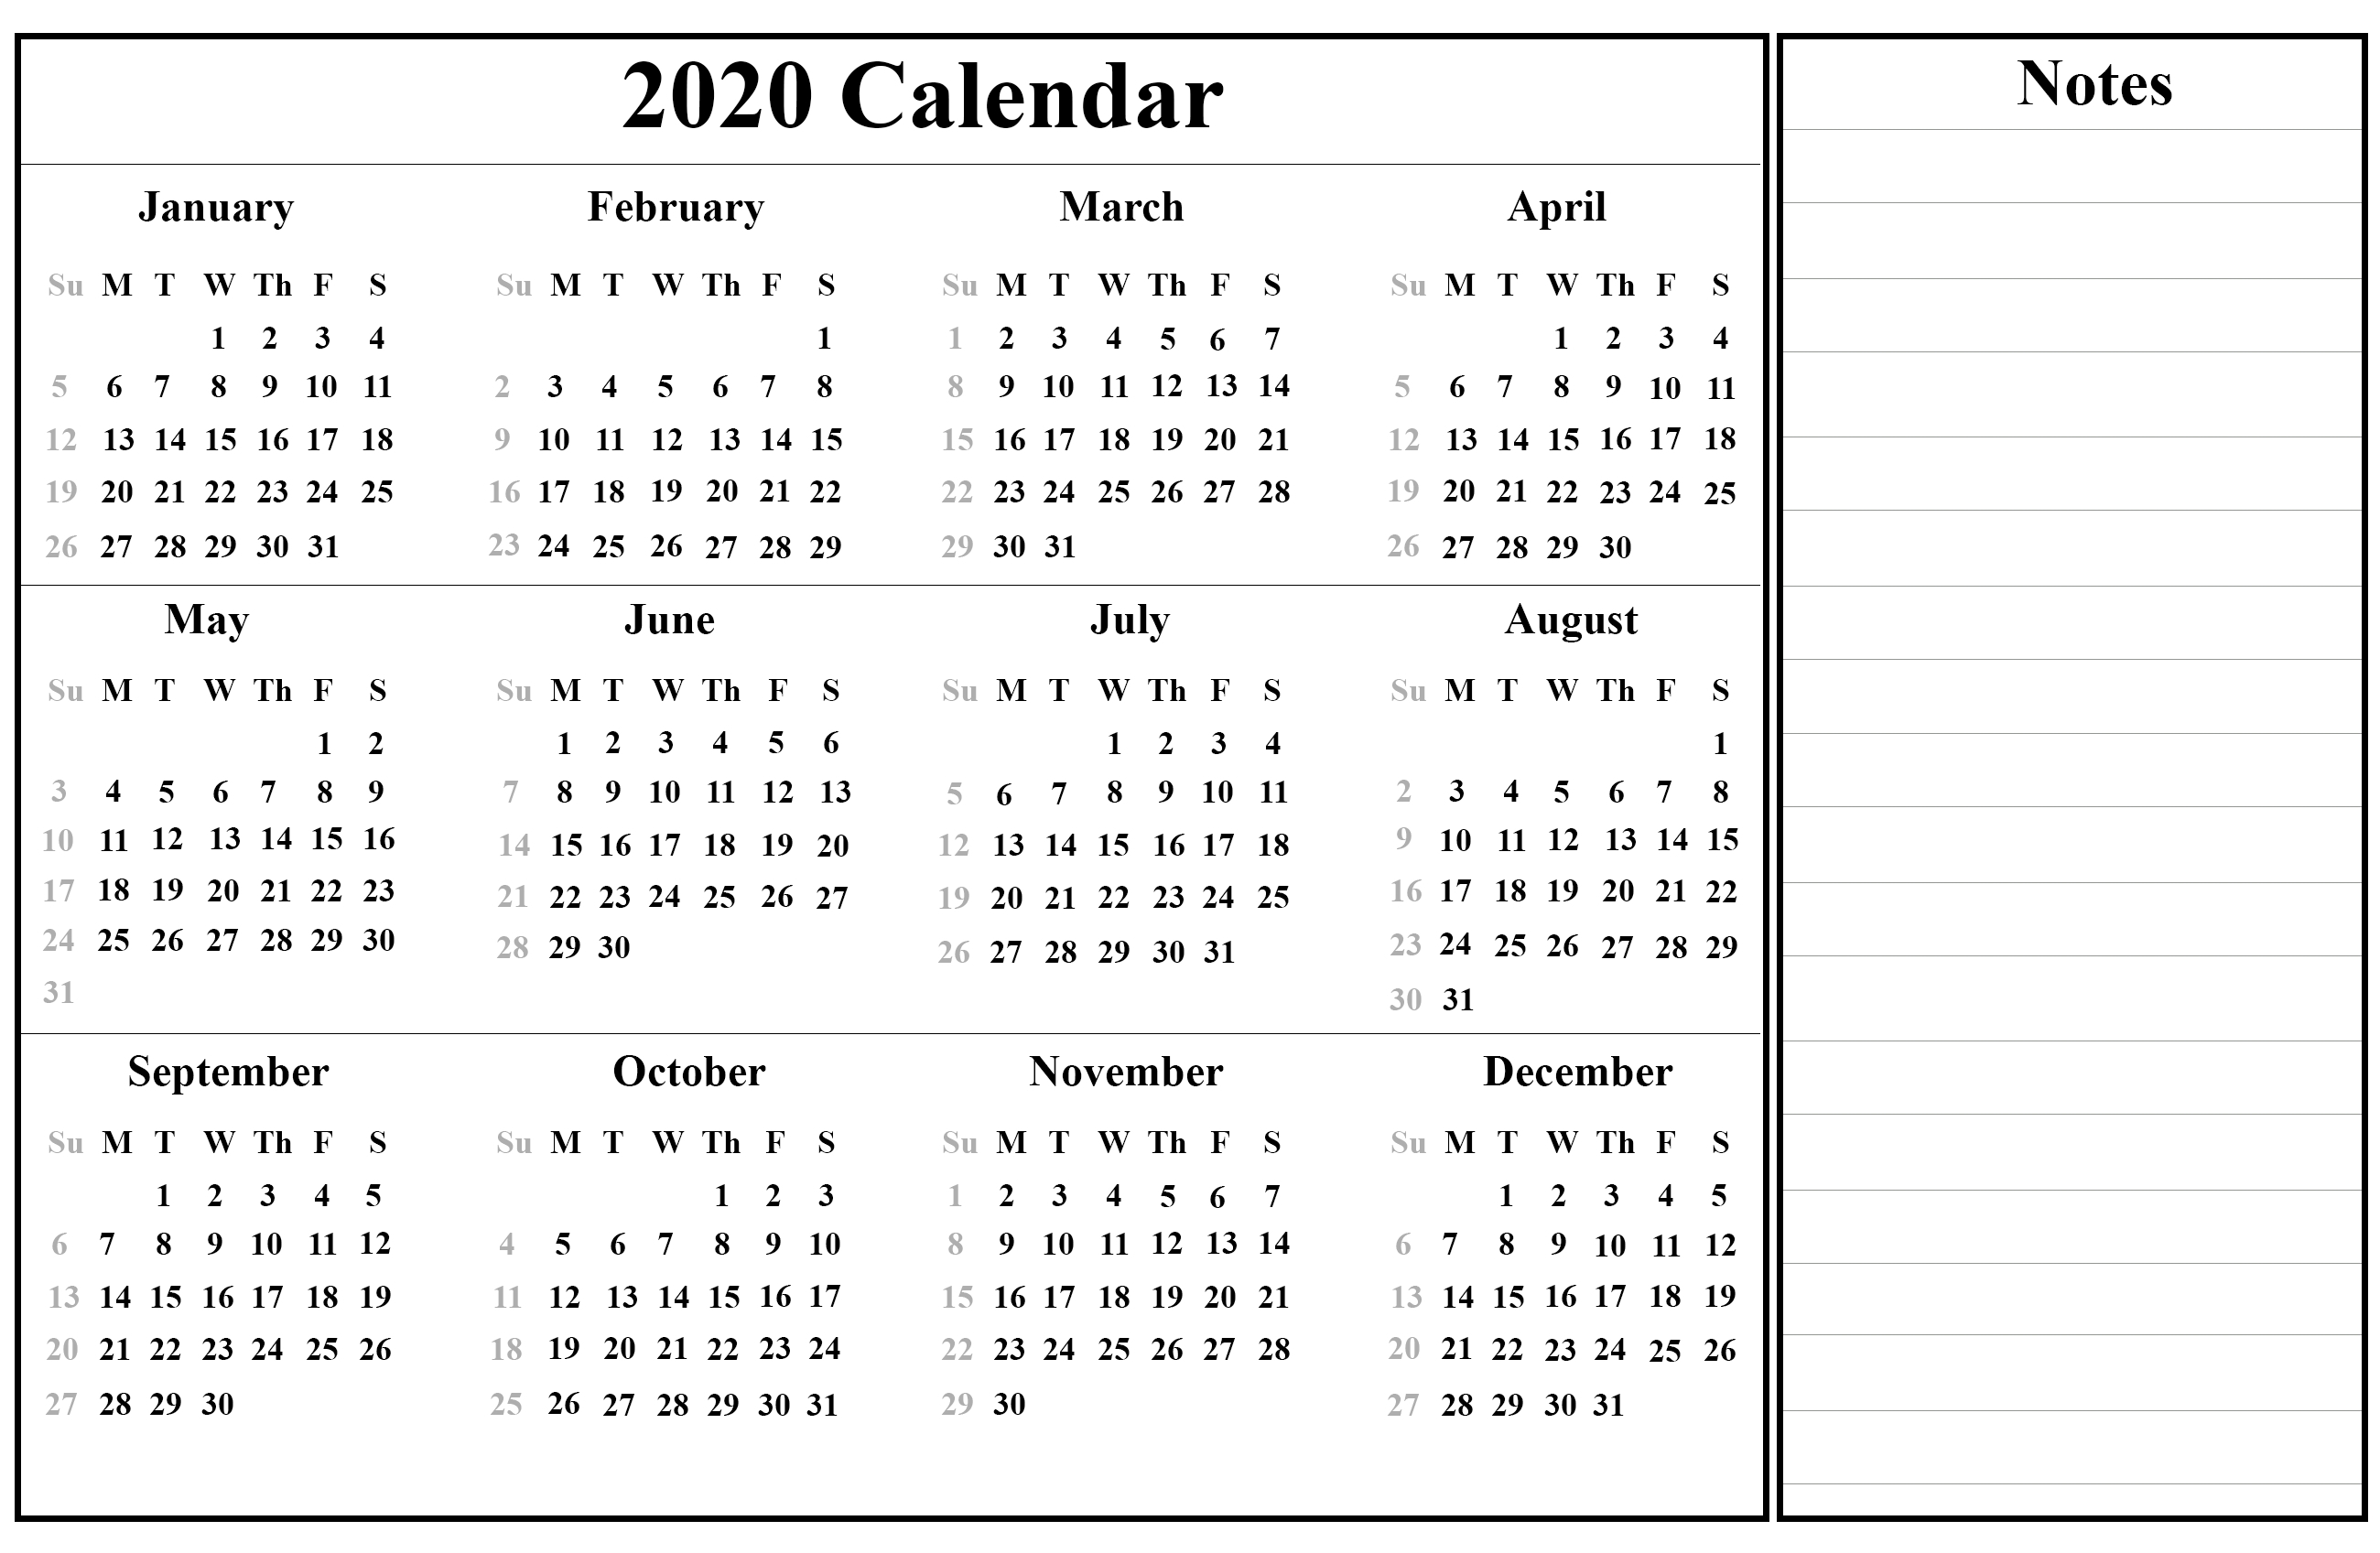 Nanakshahi Calendar 2020 January | Calendar Template Printable-Gujarati Calendar 2020 January